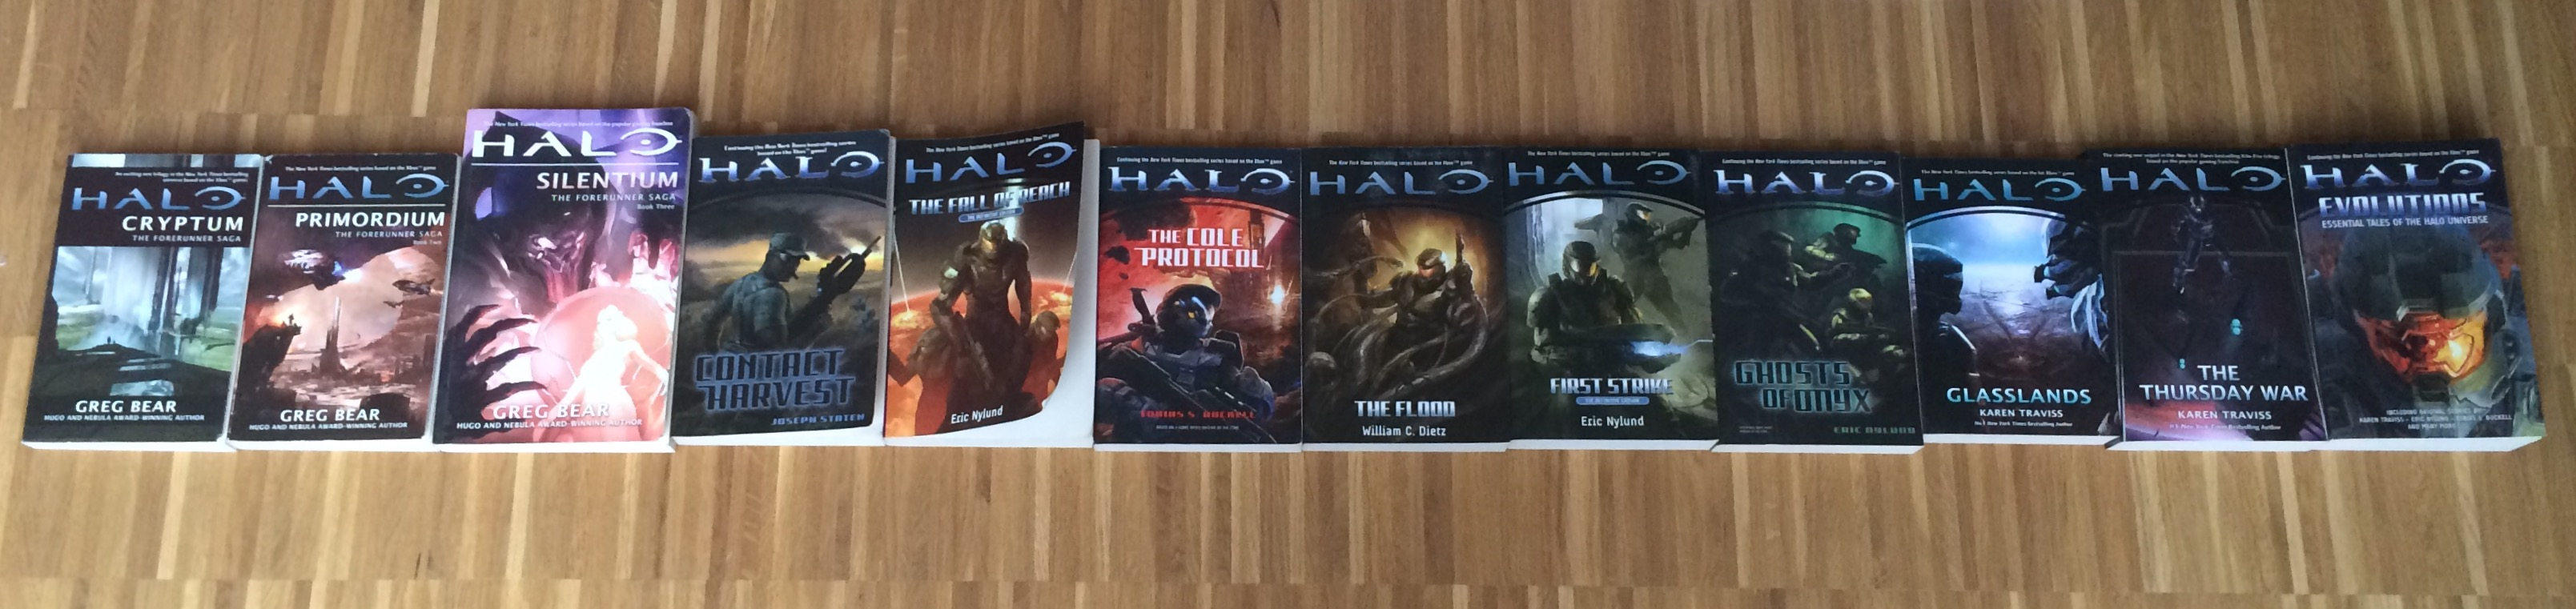 fotu_Halo_books